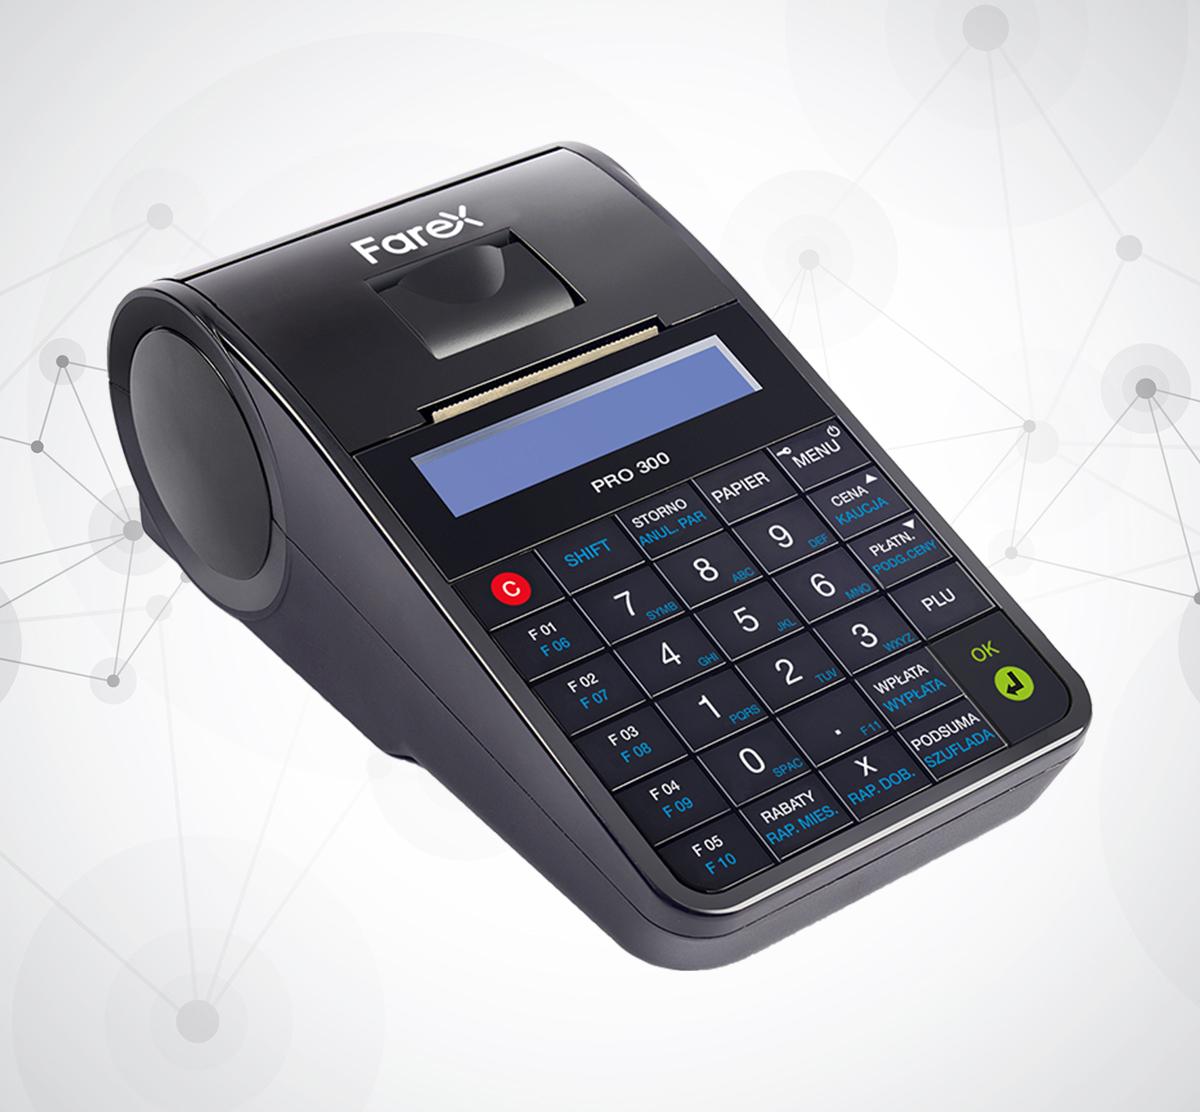 Farex Pro 300 - kasa fiskalna online